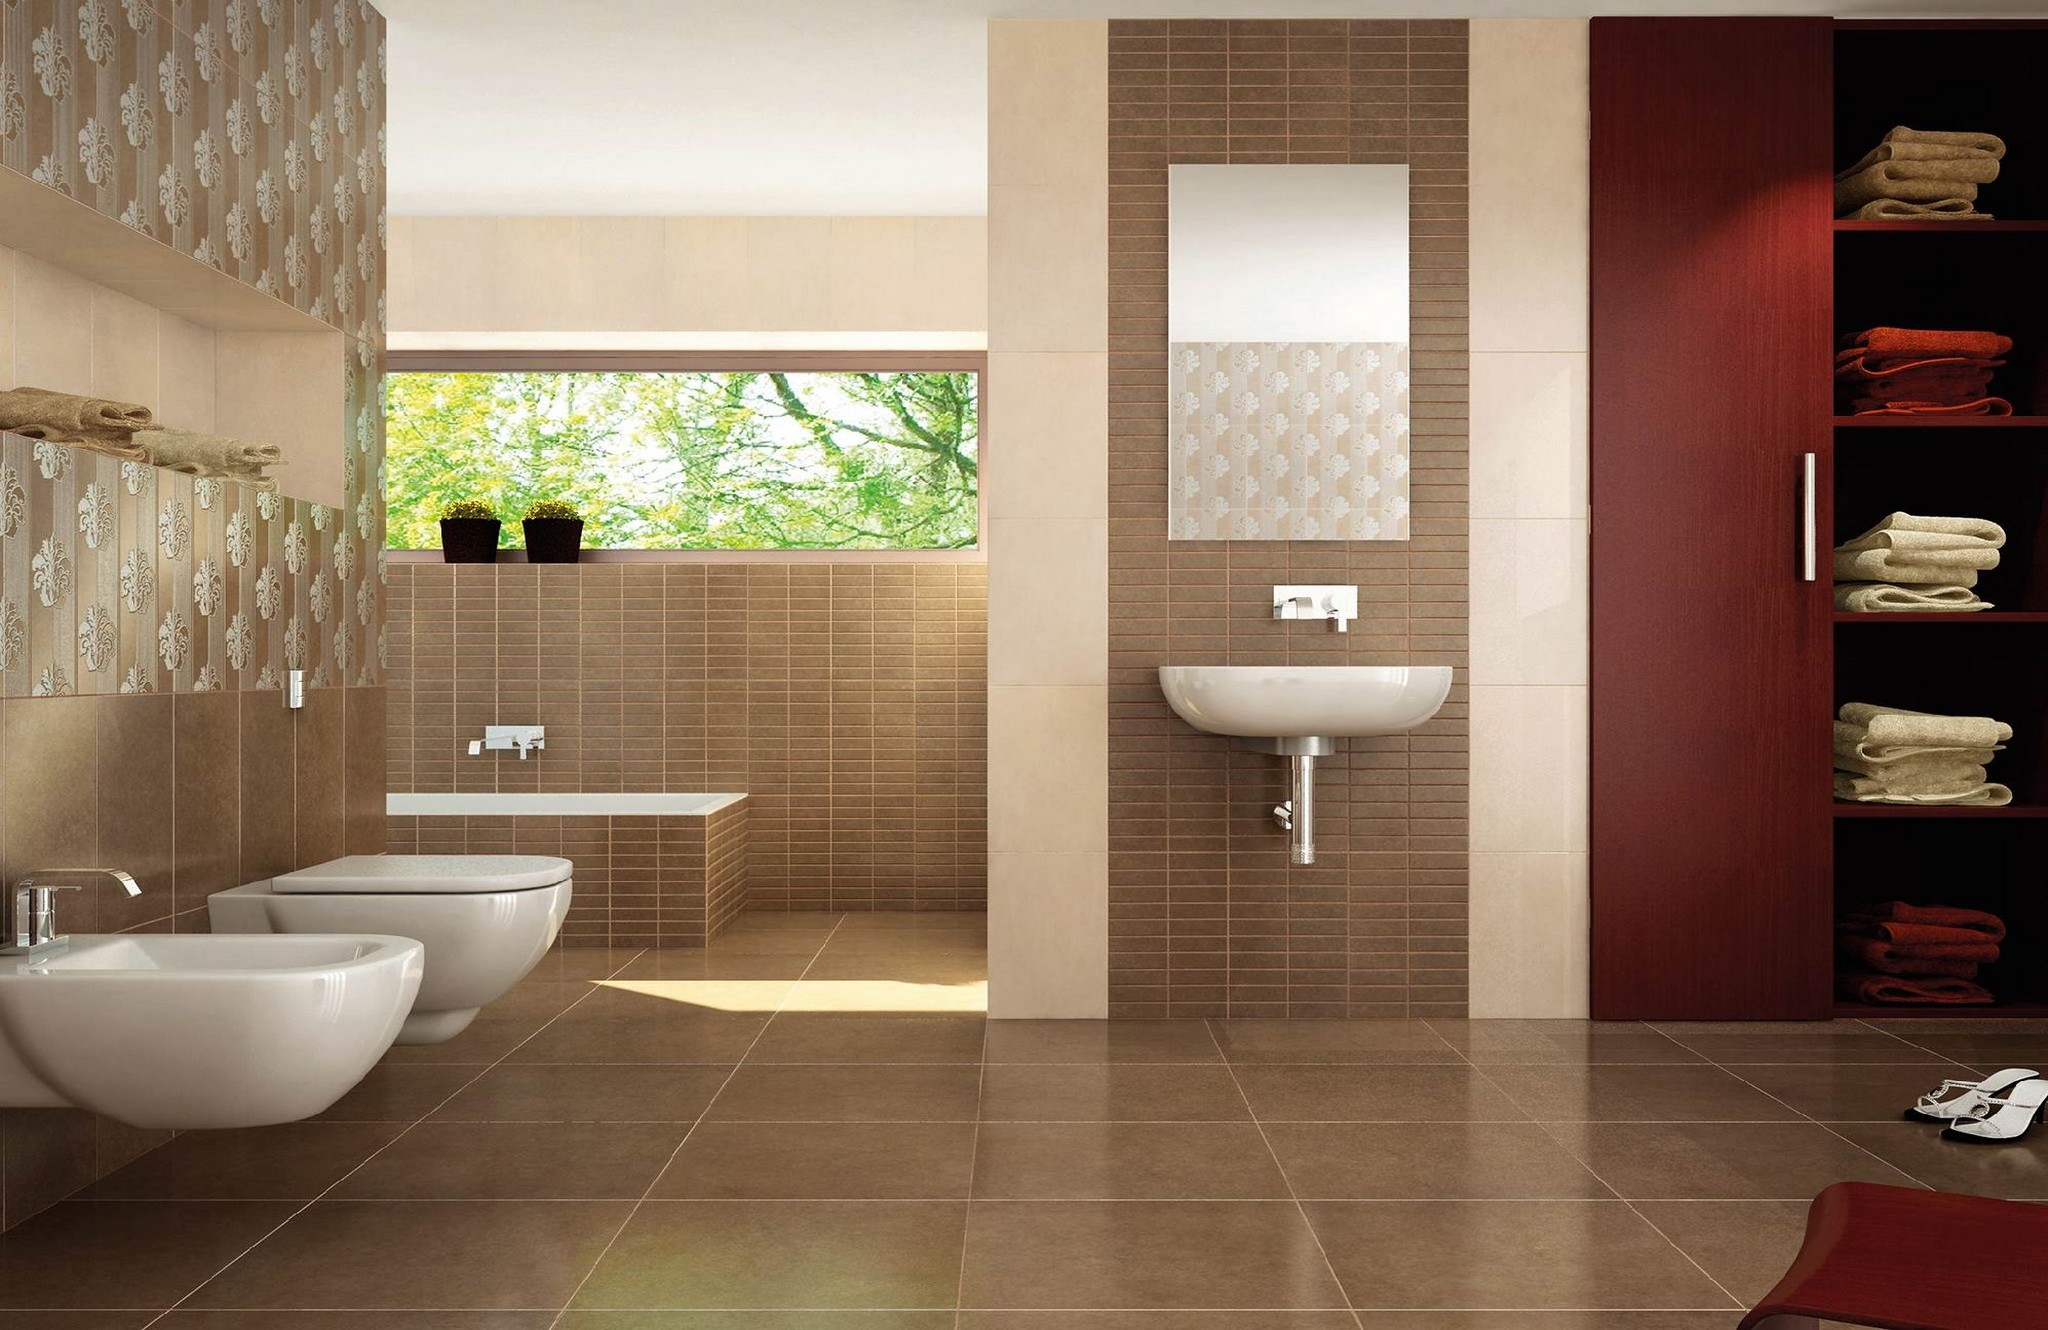 Faience salle de bain cifre serie boston 25x40 1 choix for Choix carrelage salle de bain